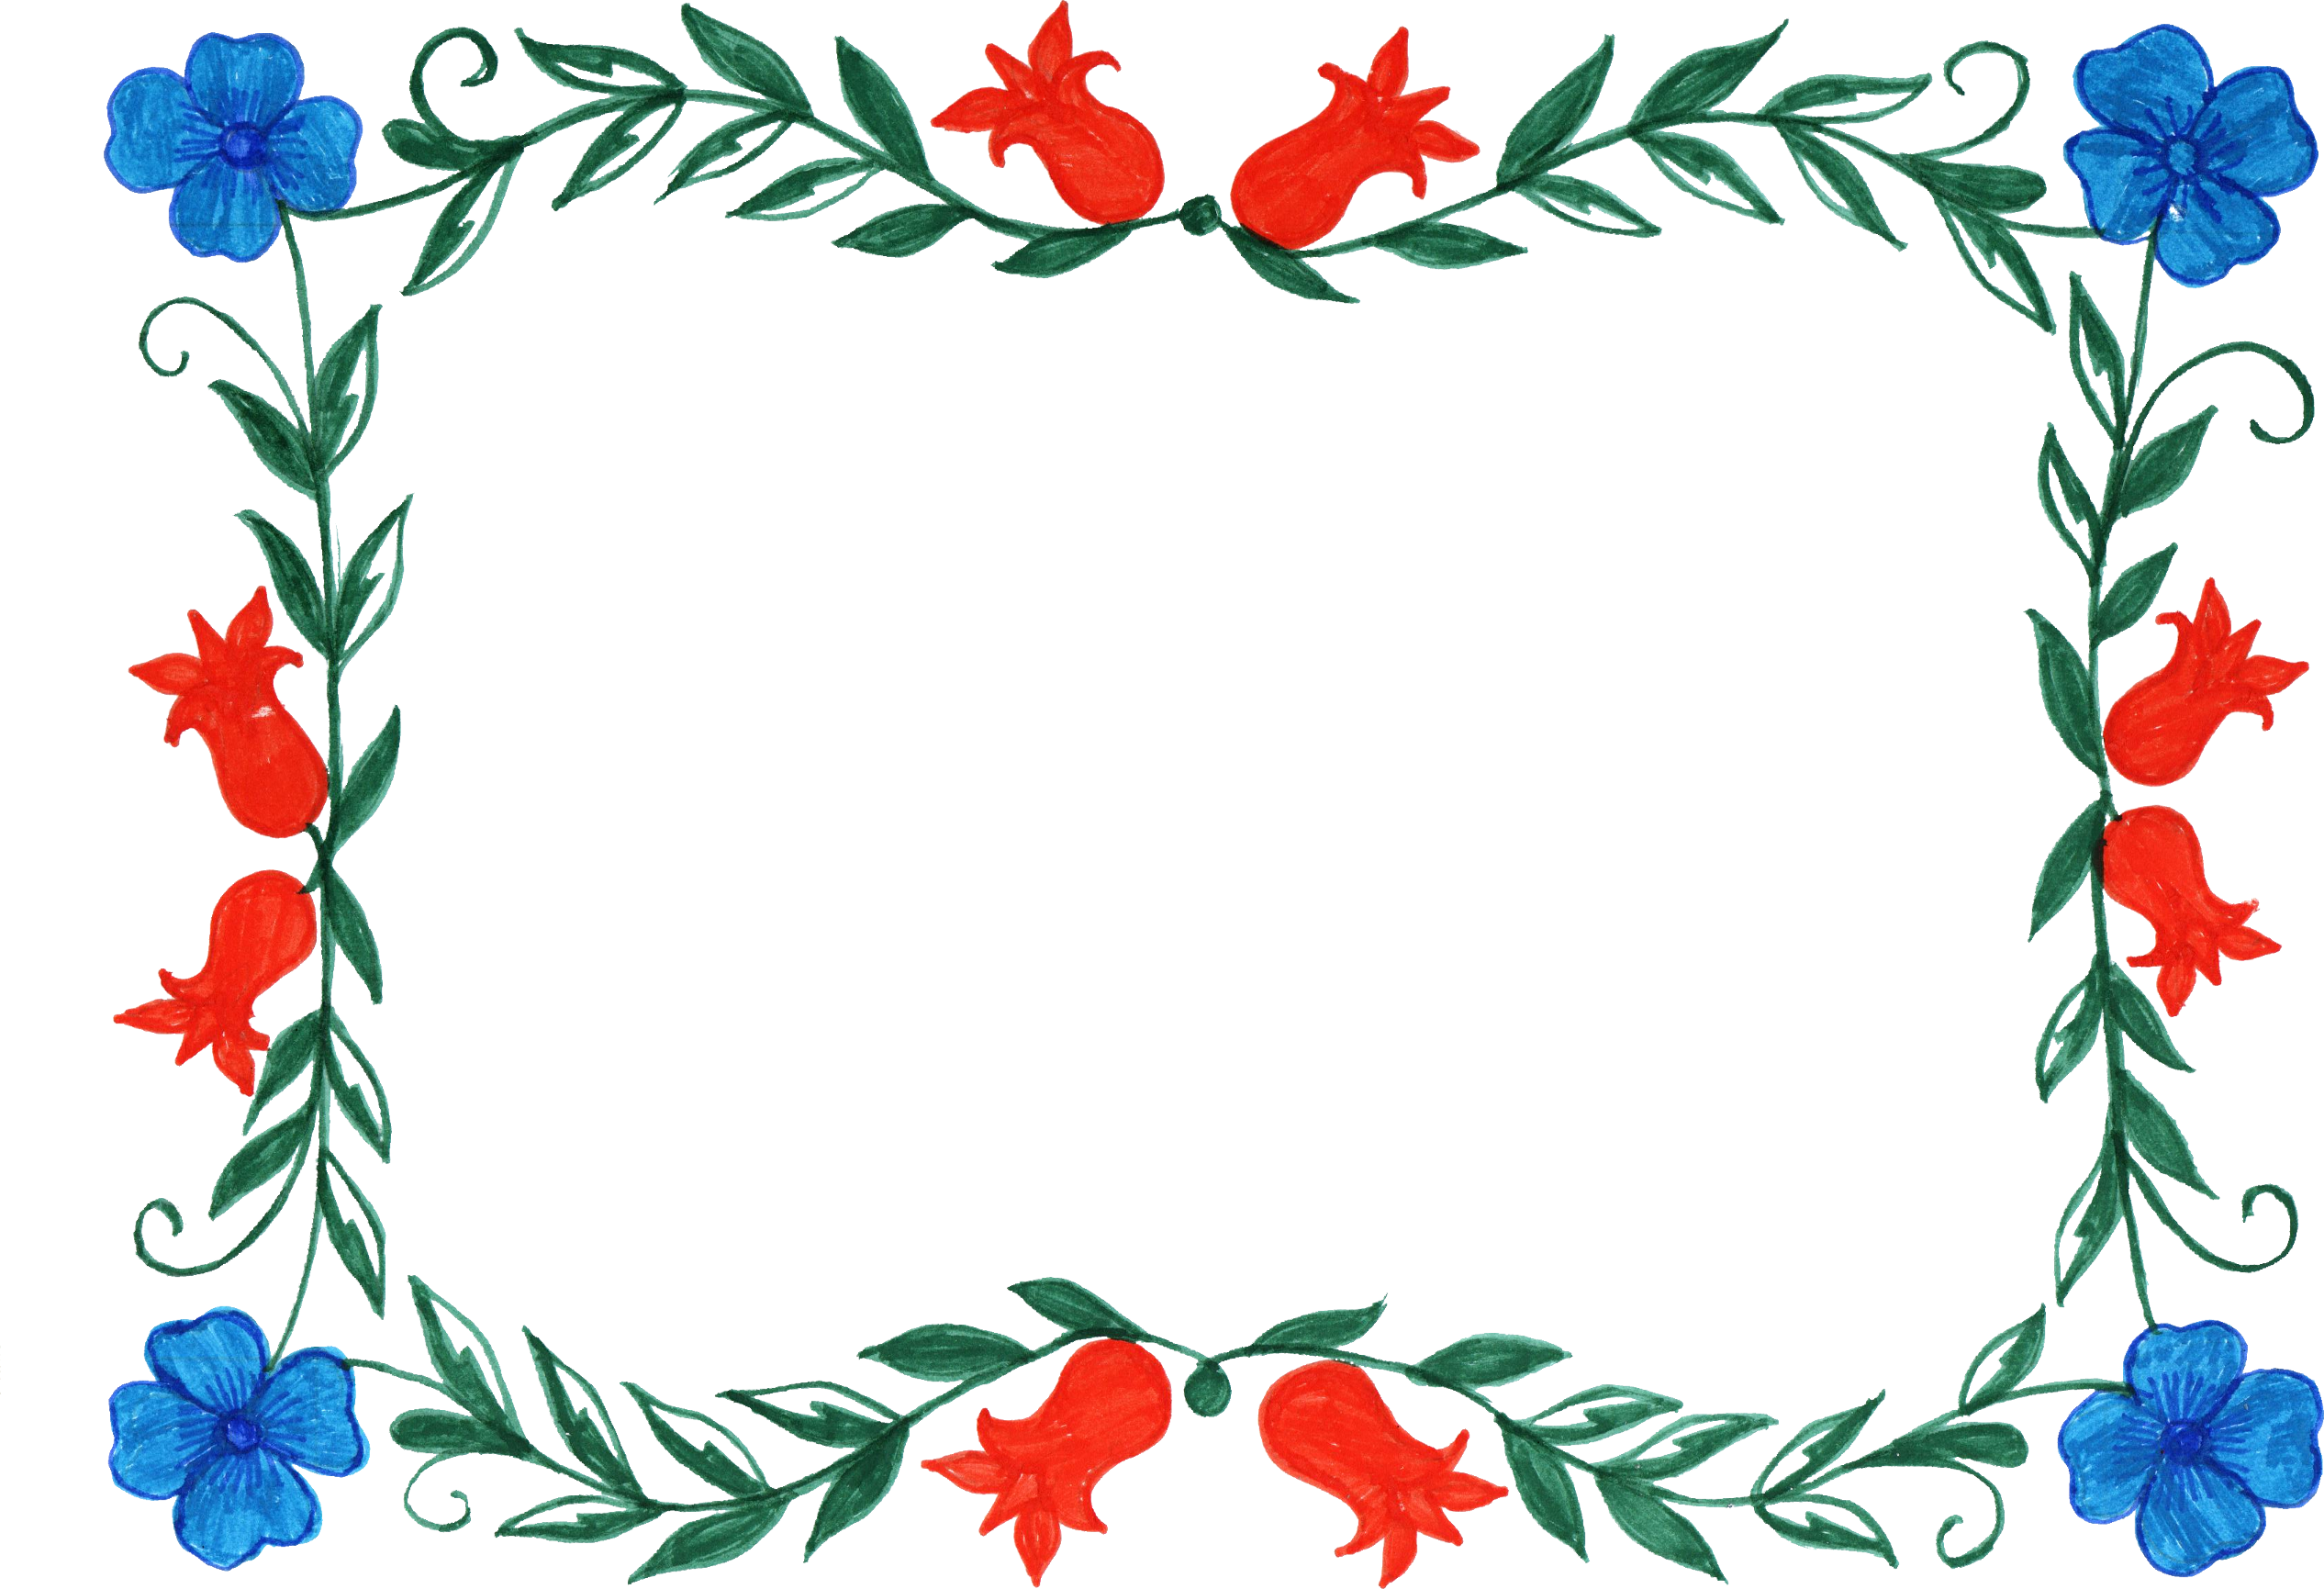 6 Flower Frame Colorful Rectangle (PNG Transparent) | OnlyGFX.com